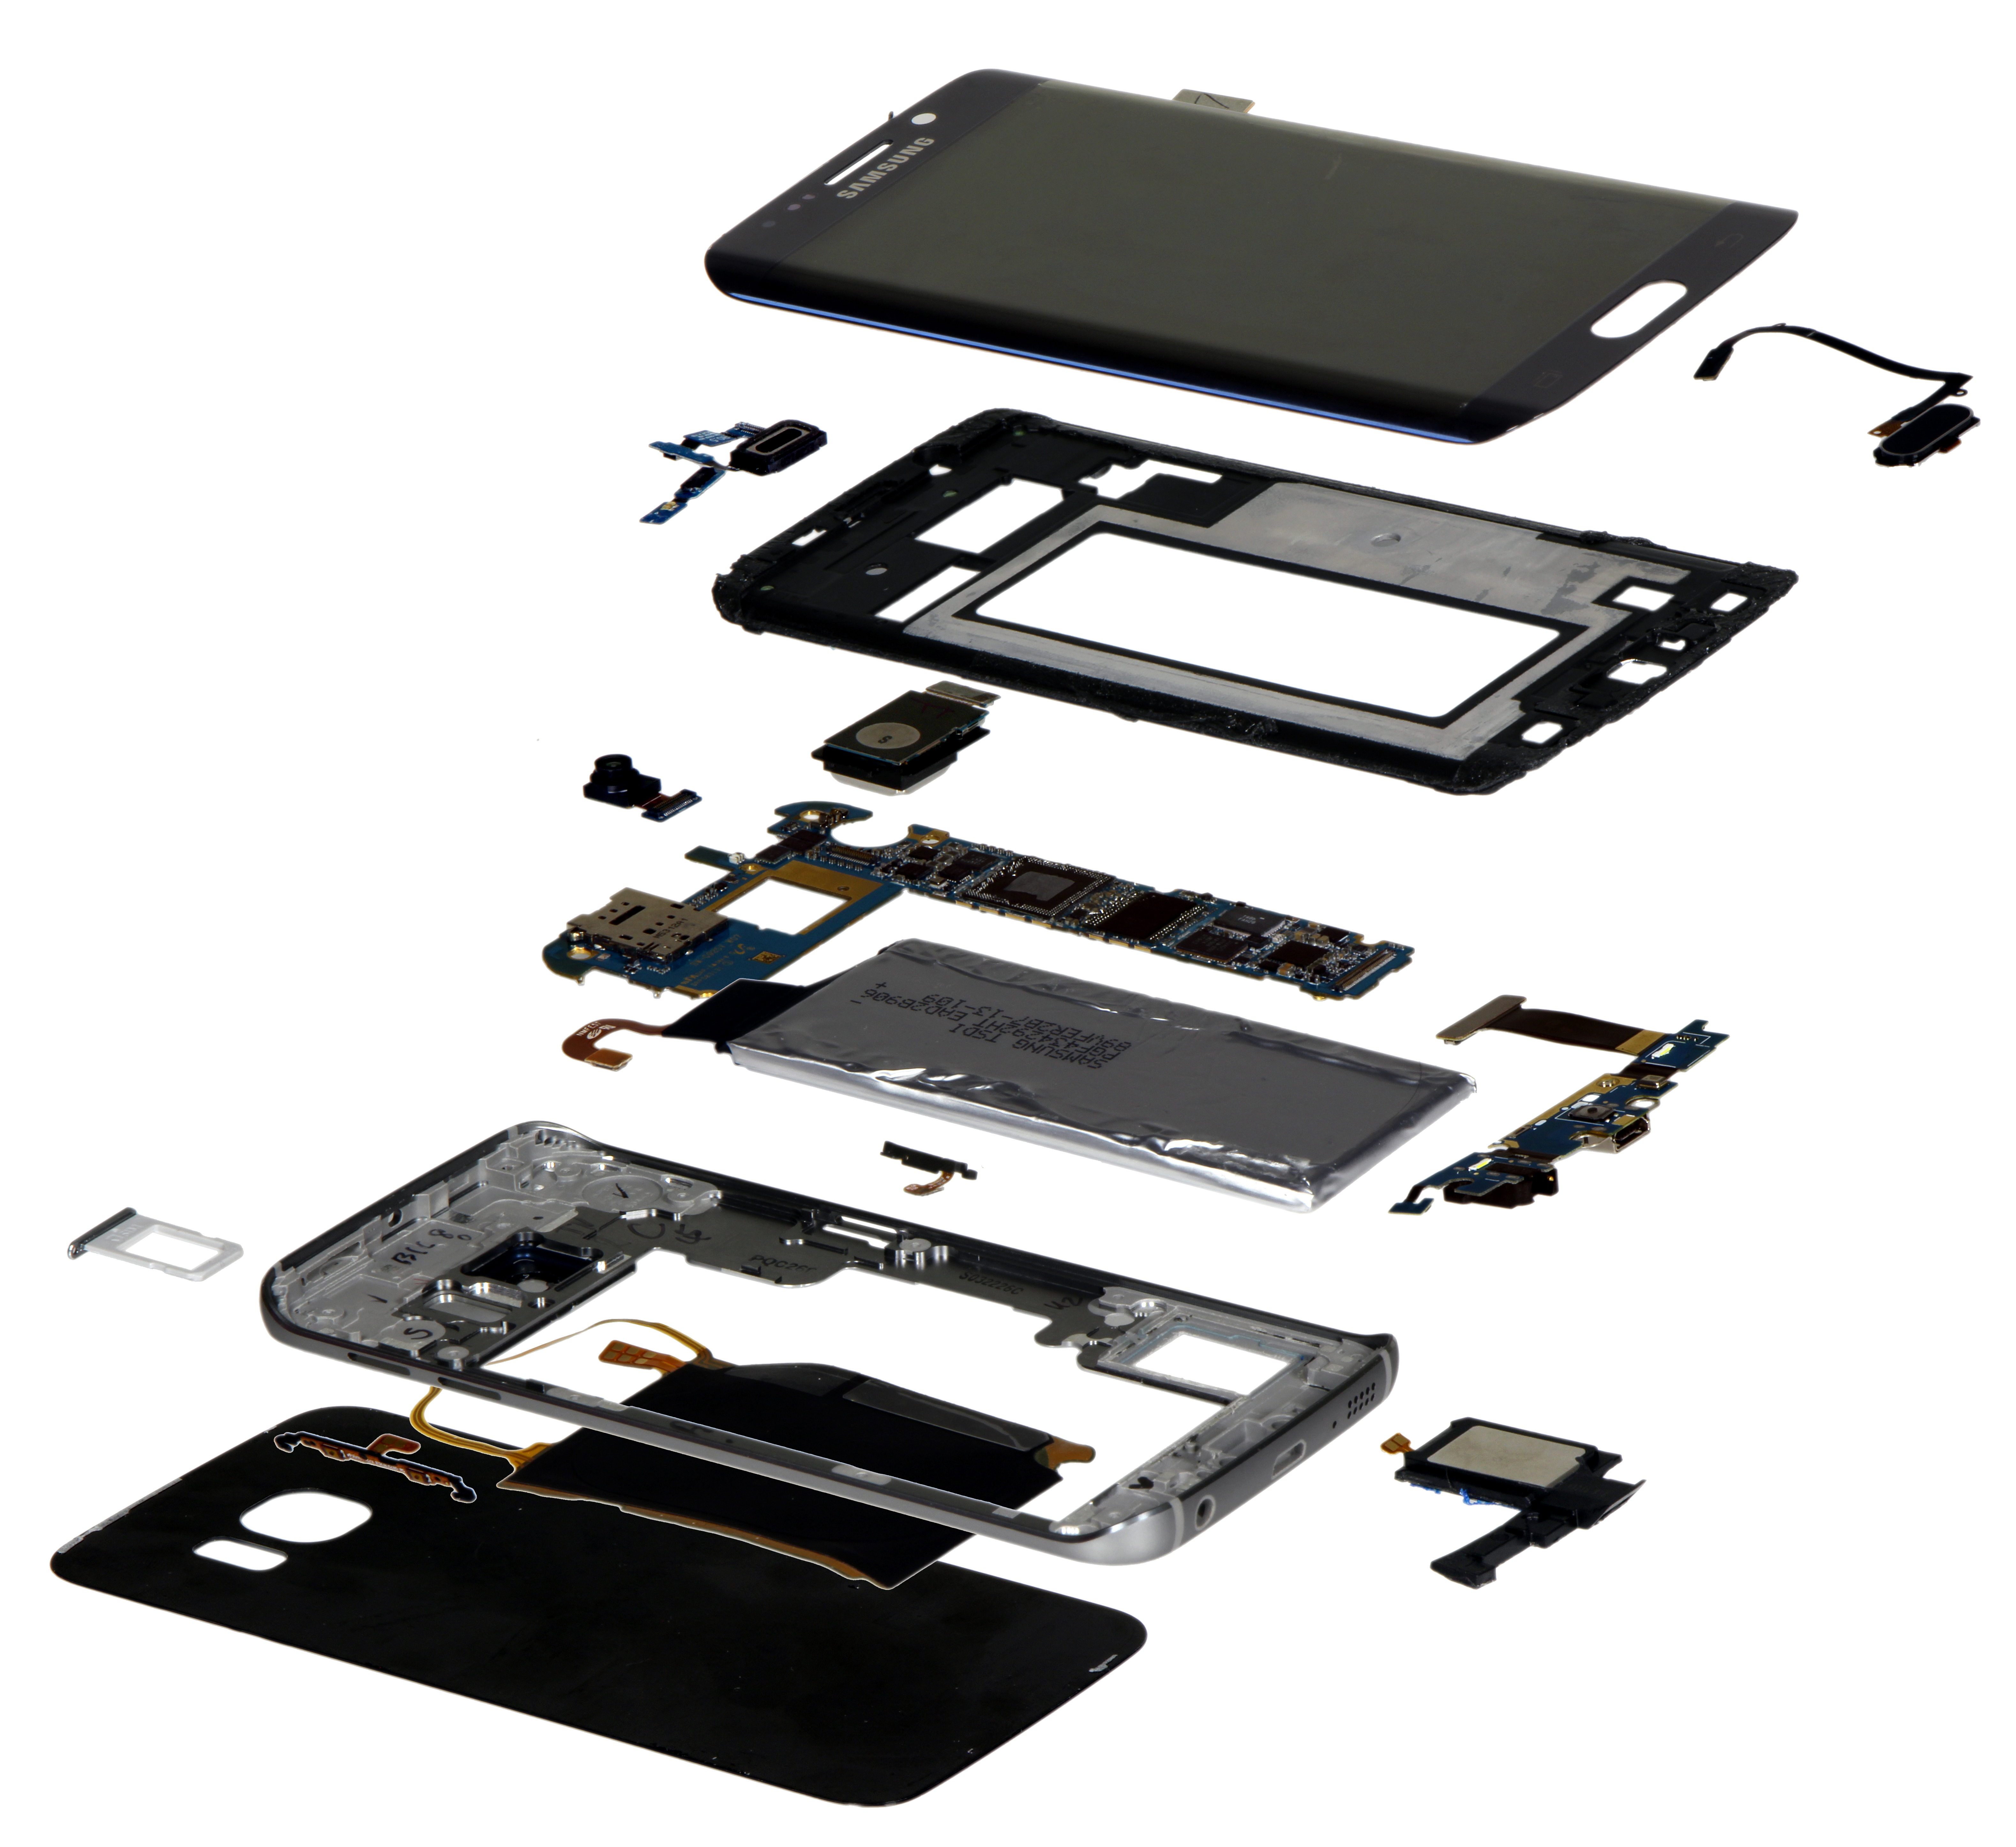 Samsung Galaxy S6 Edge Pricier To Build, Cheaper To Buy